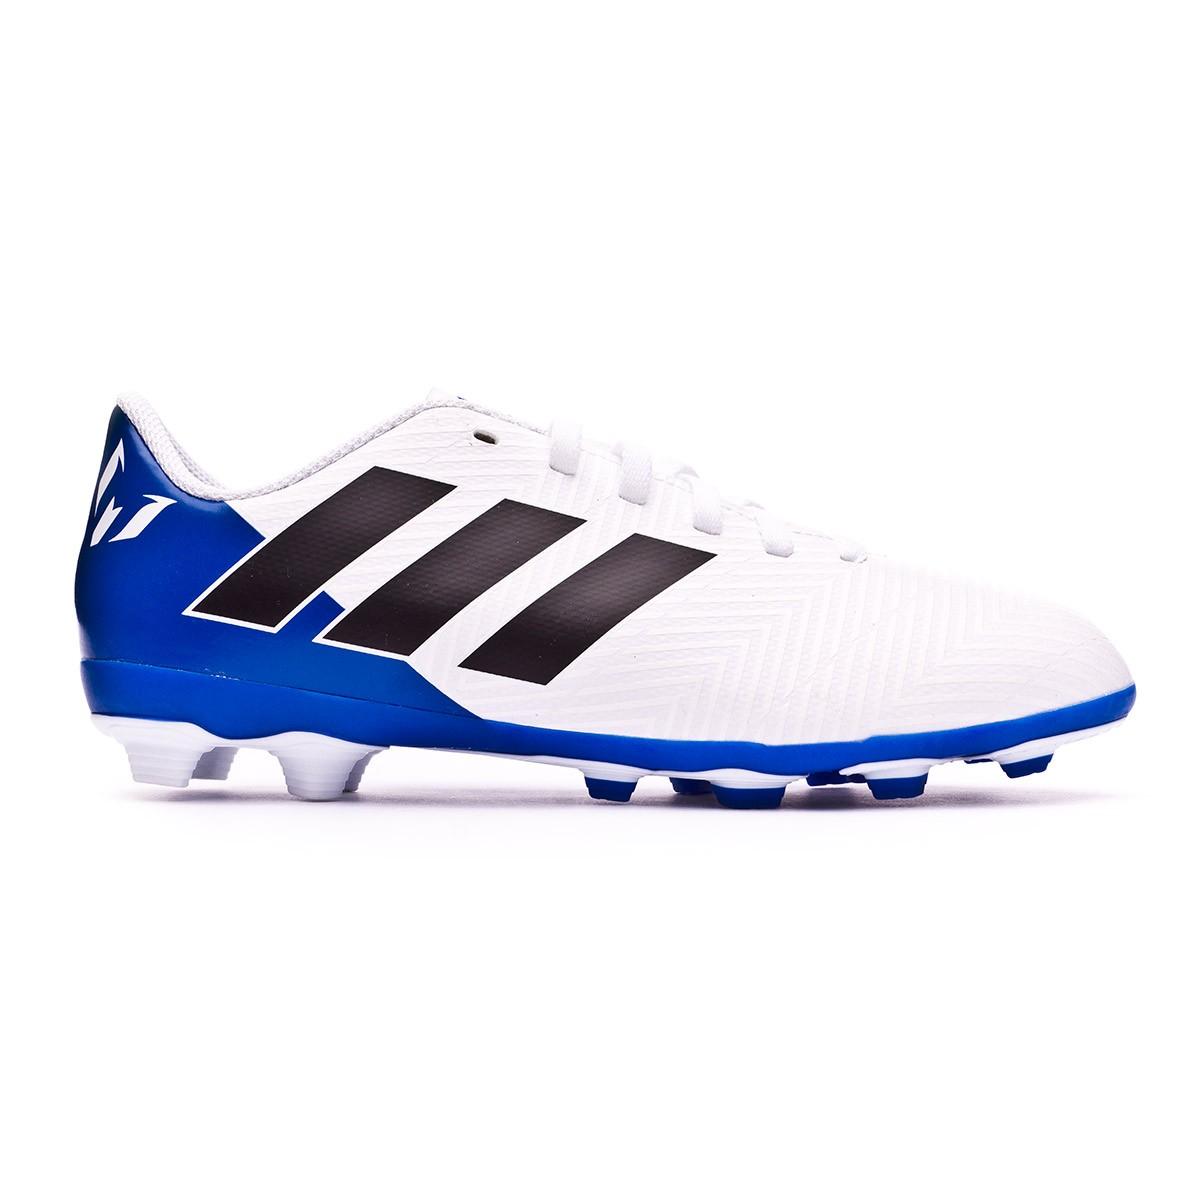 2e343d4b8 Football Boots adidas Nemeziz Messi 18.4 FG White-Core black-Football blue  - Football store Fútbol Emotion